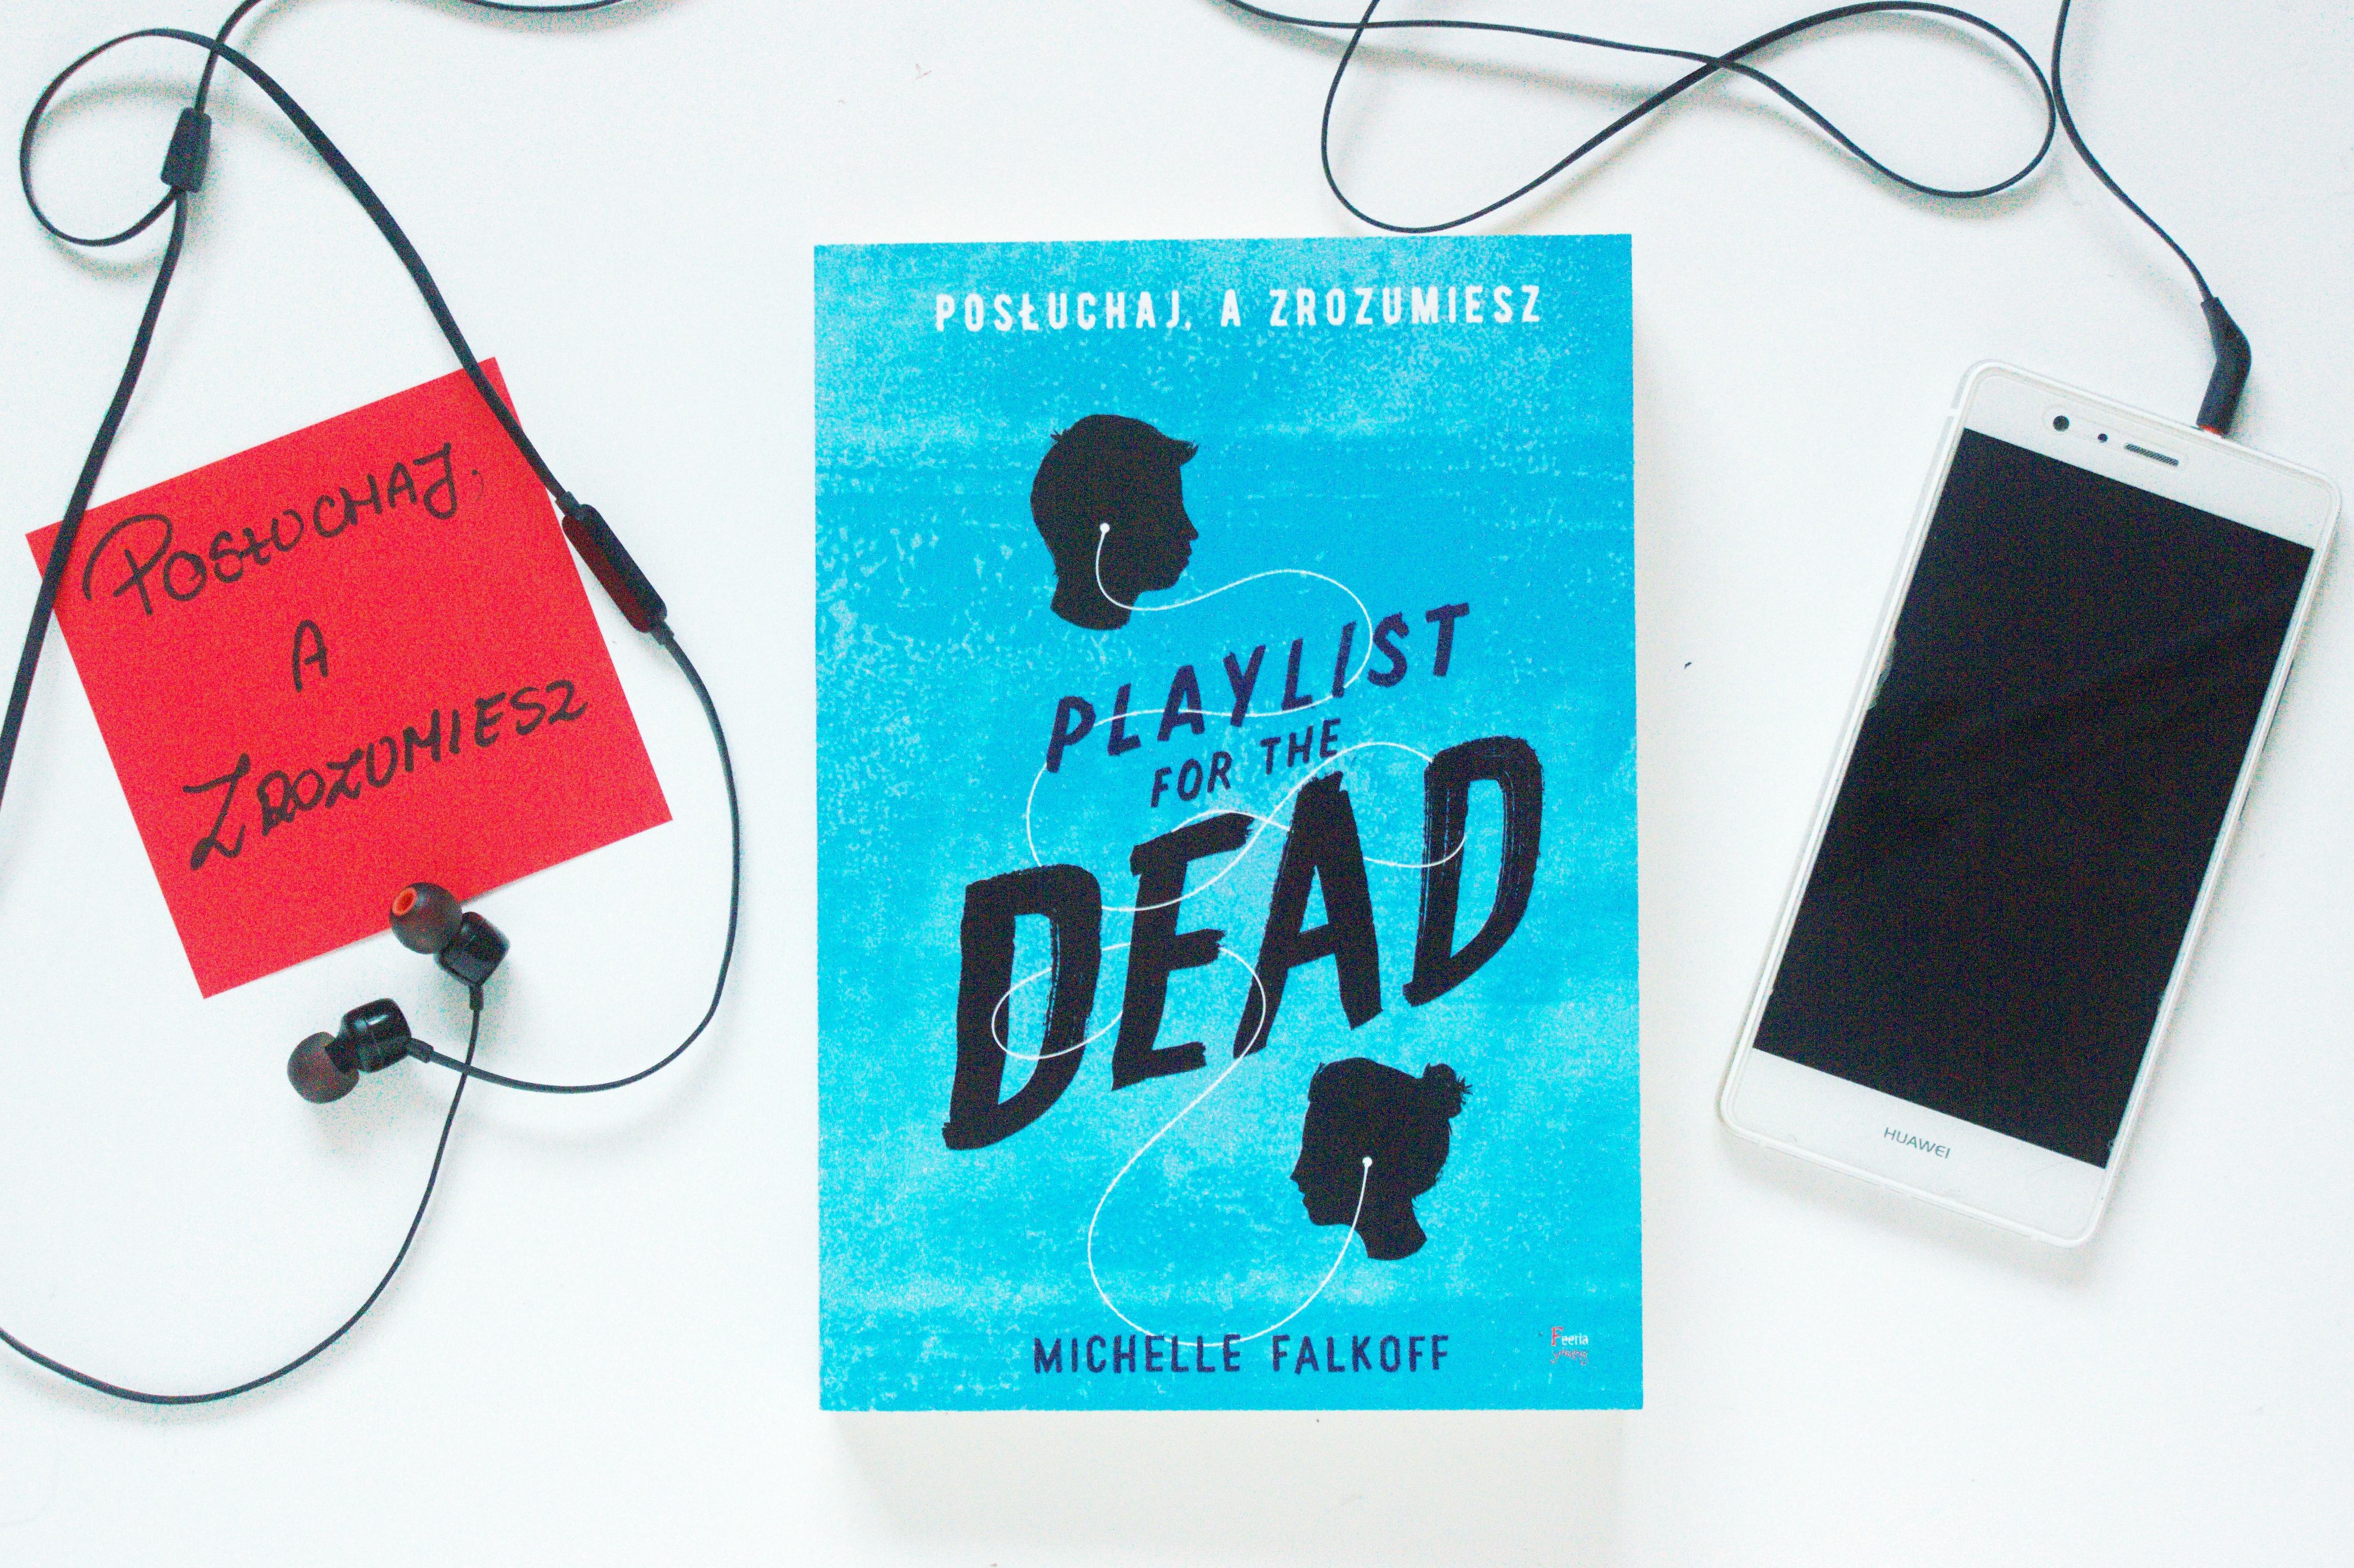 playlist for the dead posłuchaj azrozumiesz michelle falkoff